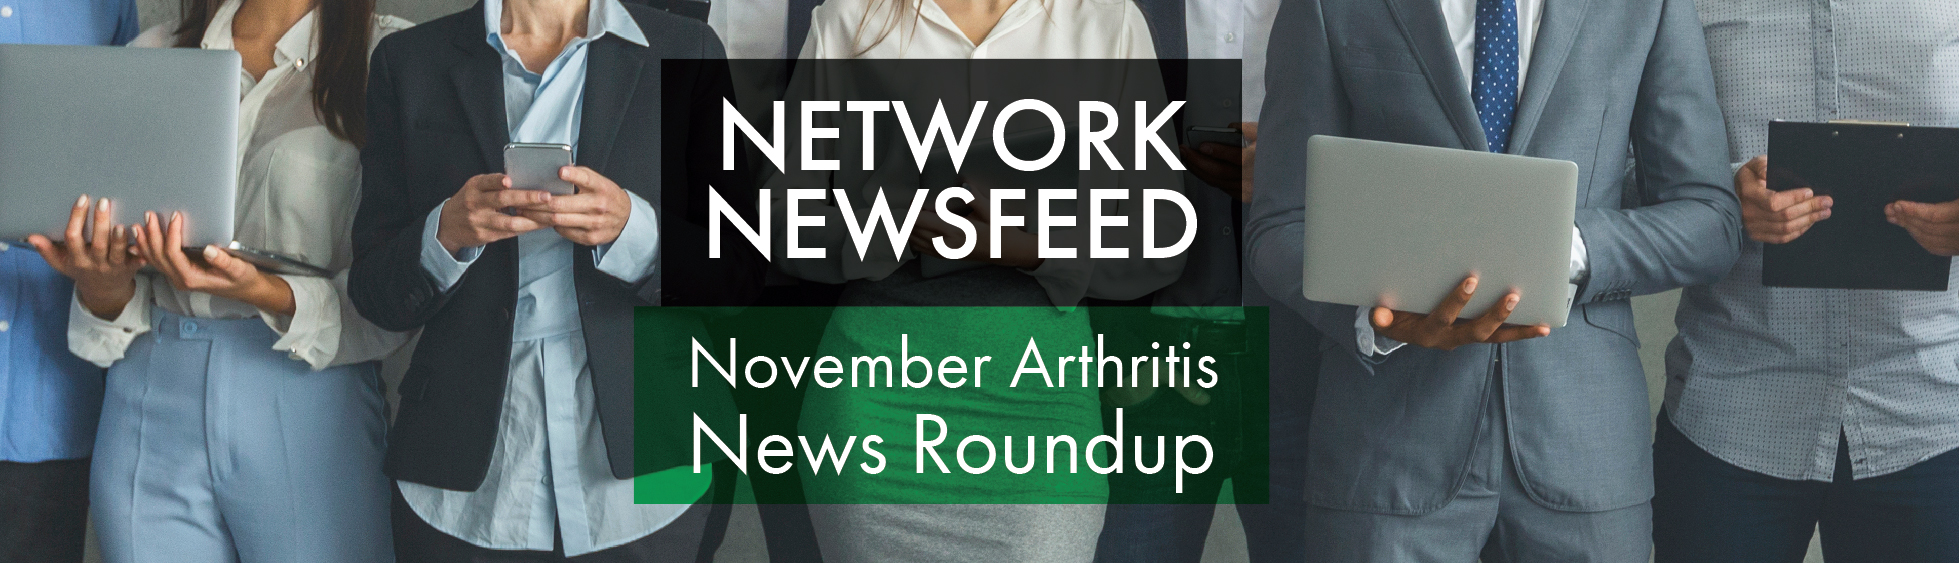 November Arthritis News Roundup